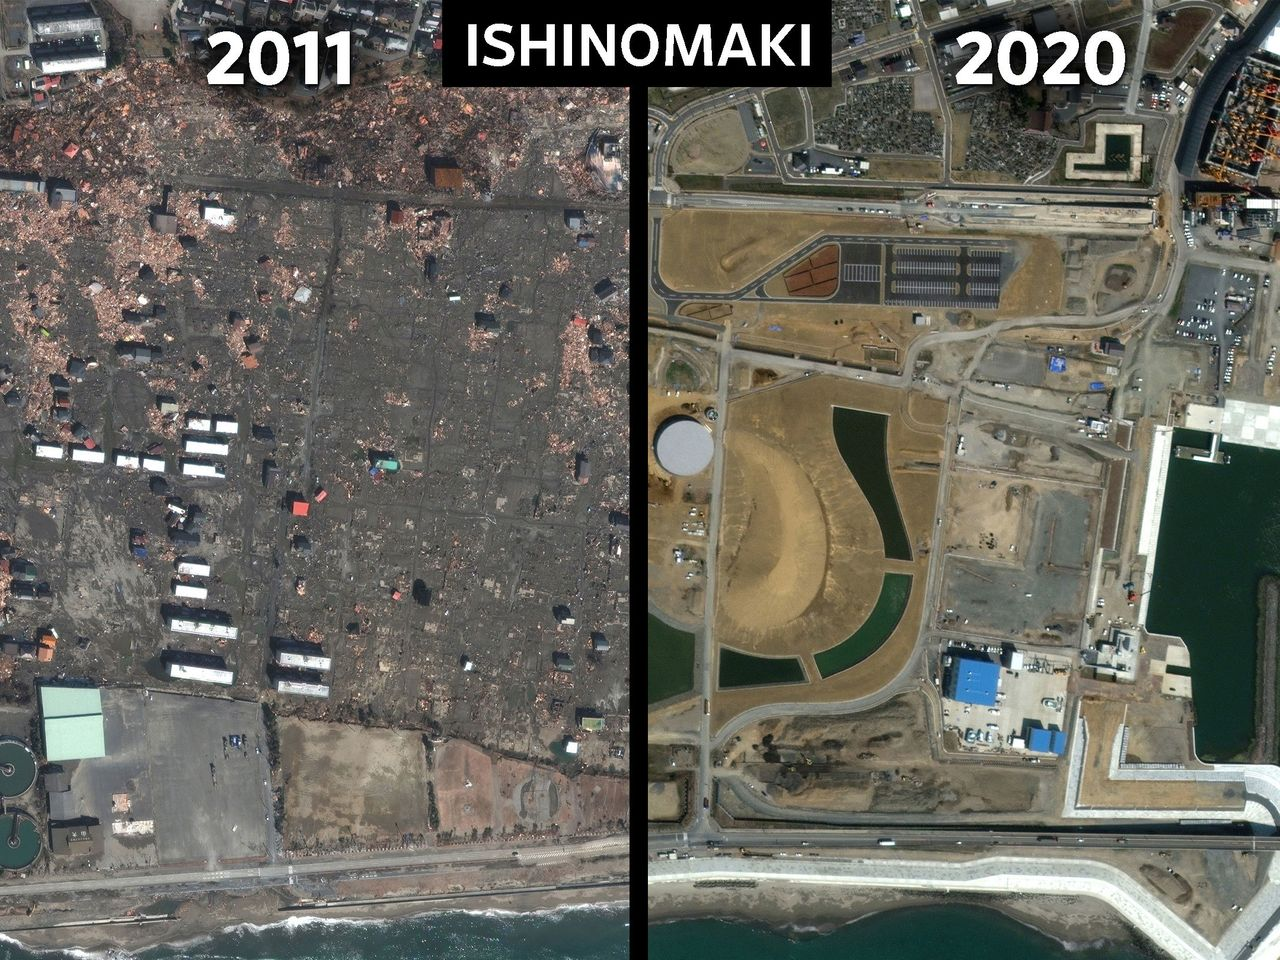 fukushima_reconstruction.jpg